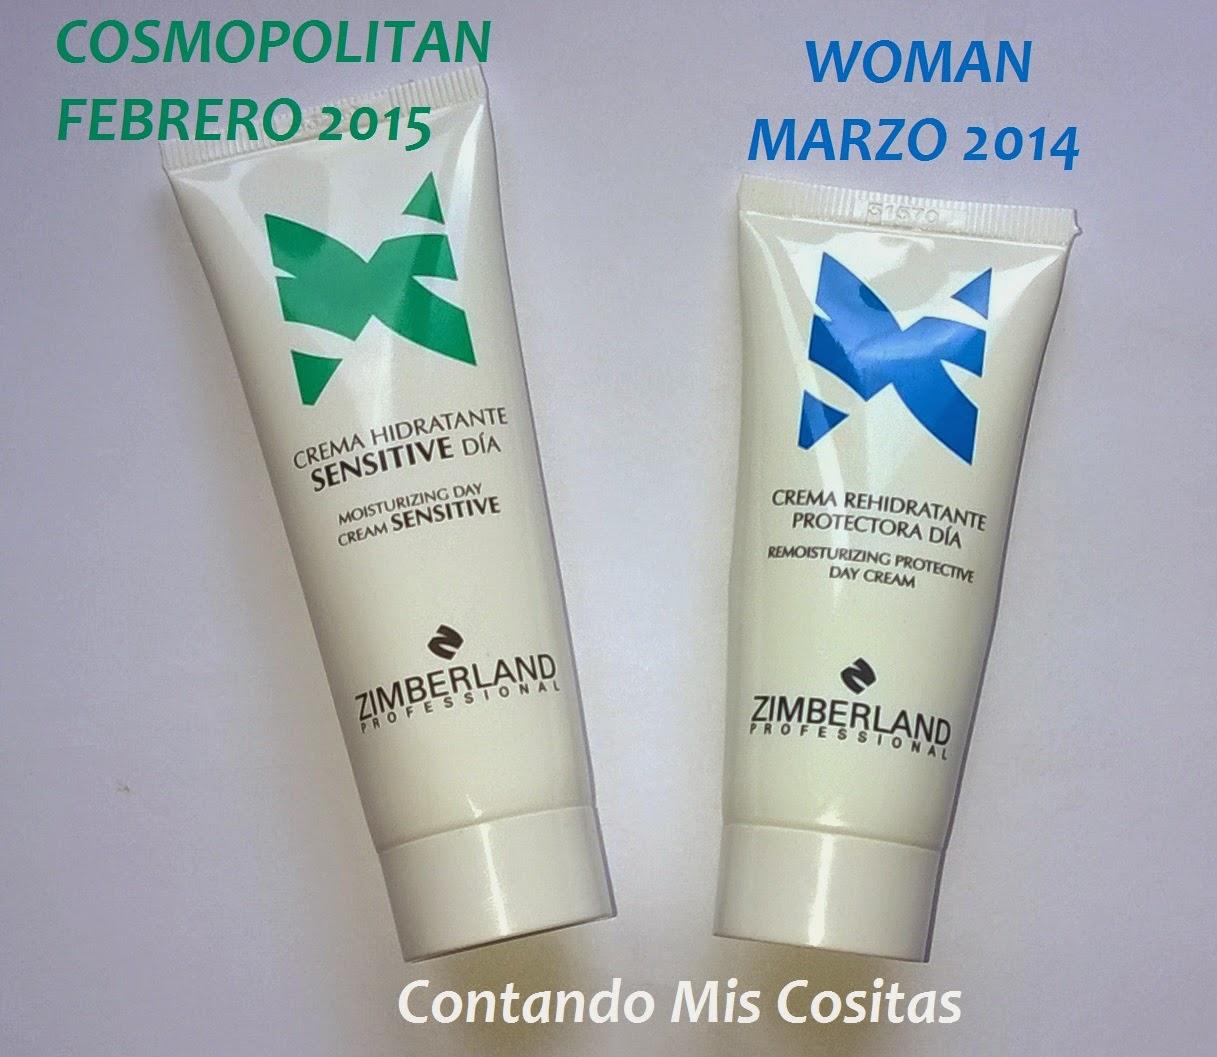 zimberland crema sensitive cosmopolitan febrero 2015